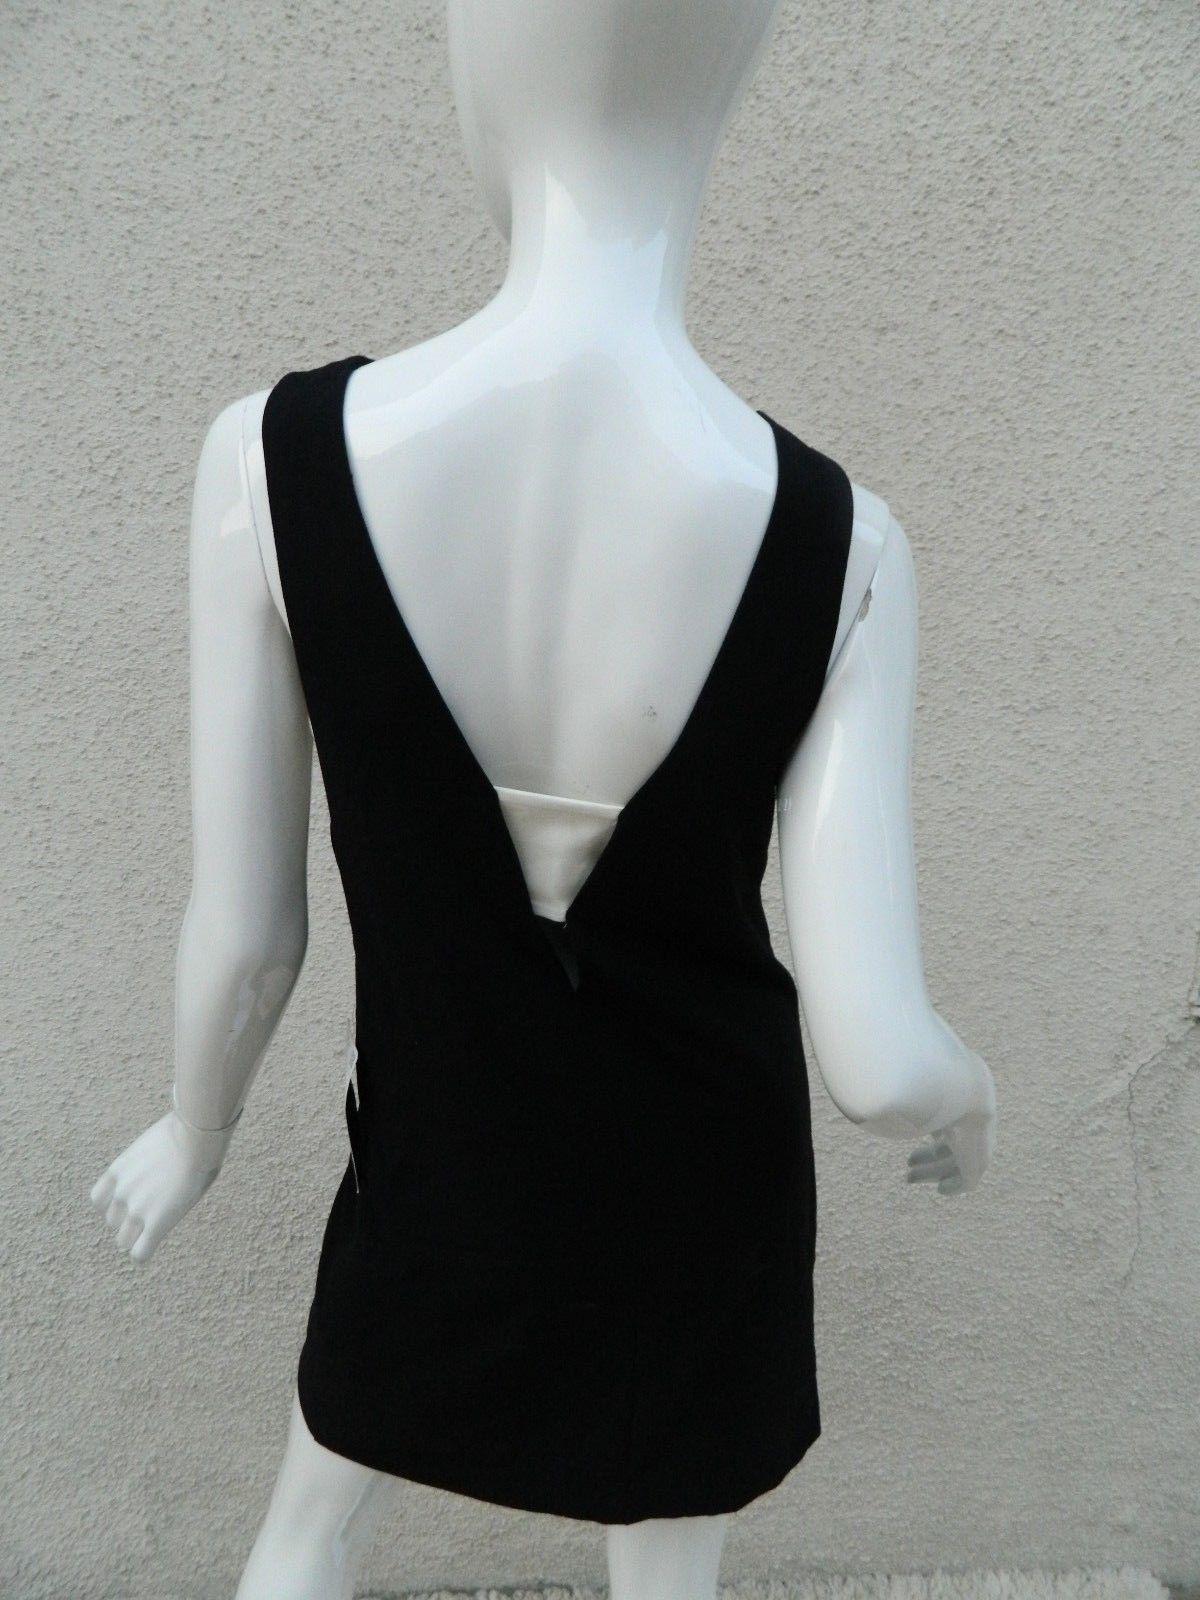 f2d4562c2ddcb1 NWT Zara Basic Dress Black   White Side Cutout Sleeveless Dress Size XS